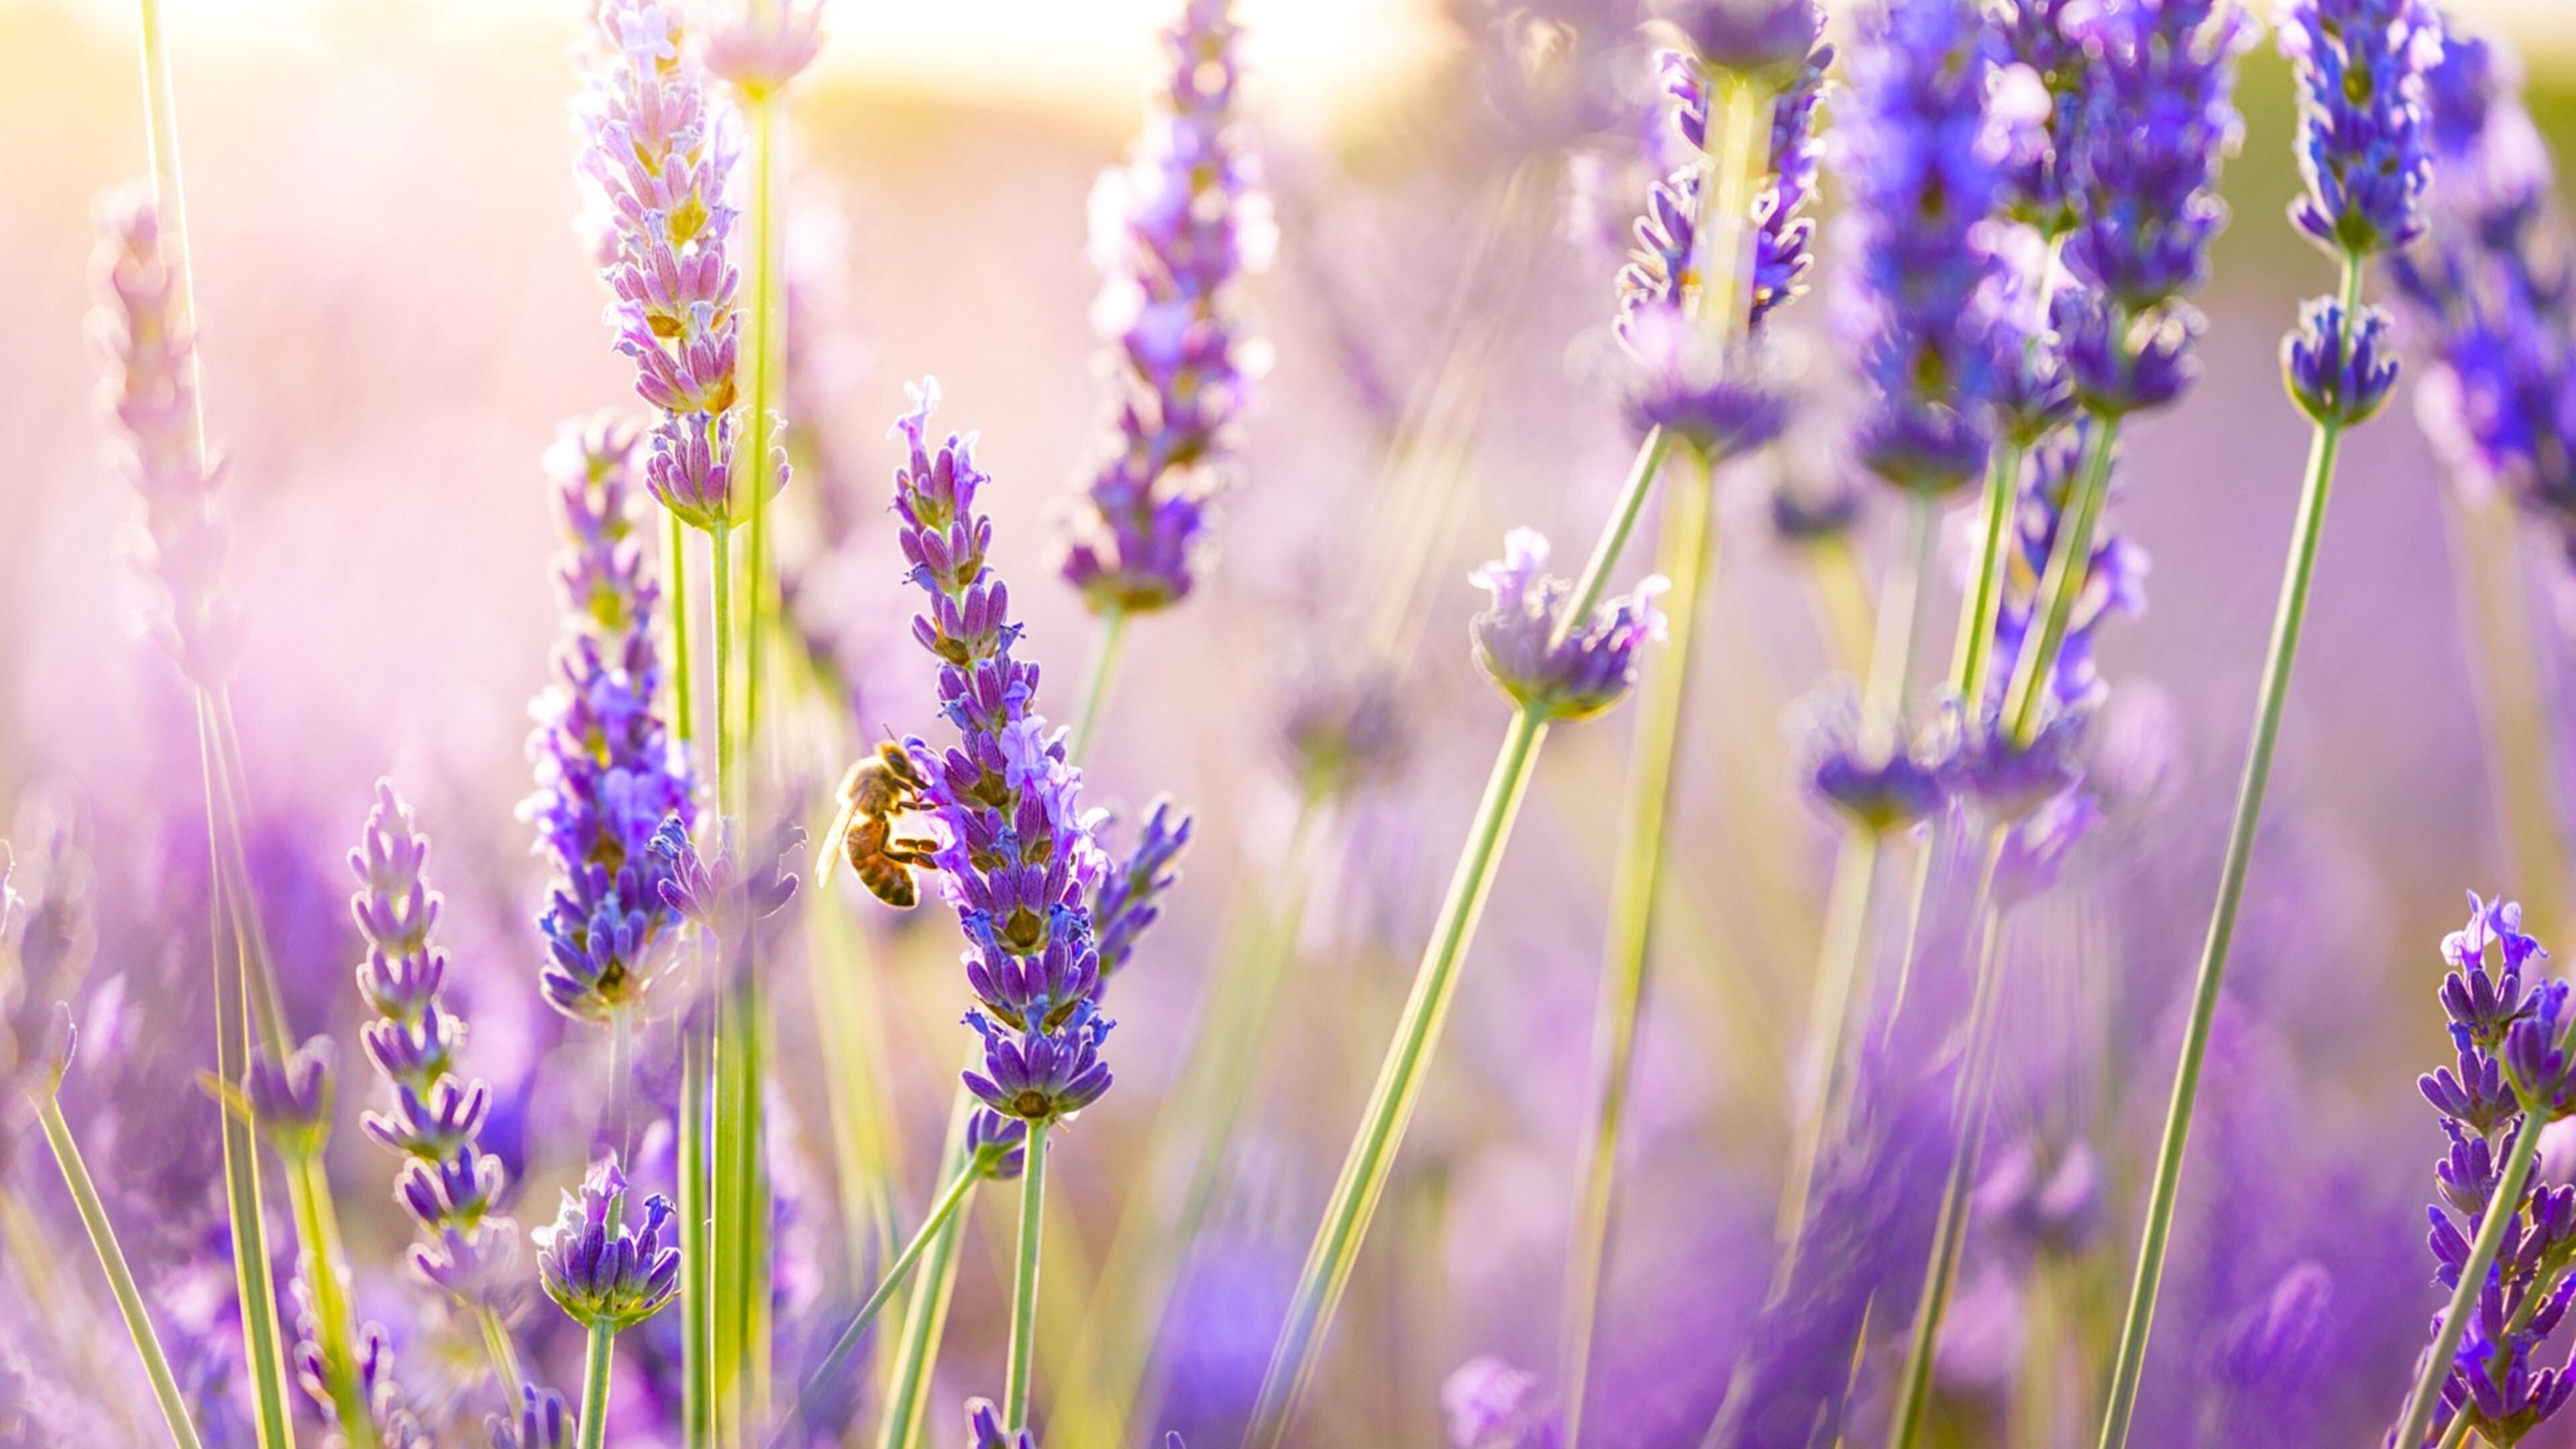 Цветы природа лаванда  № 1352111 бесплатно